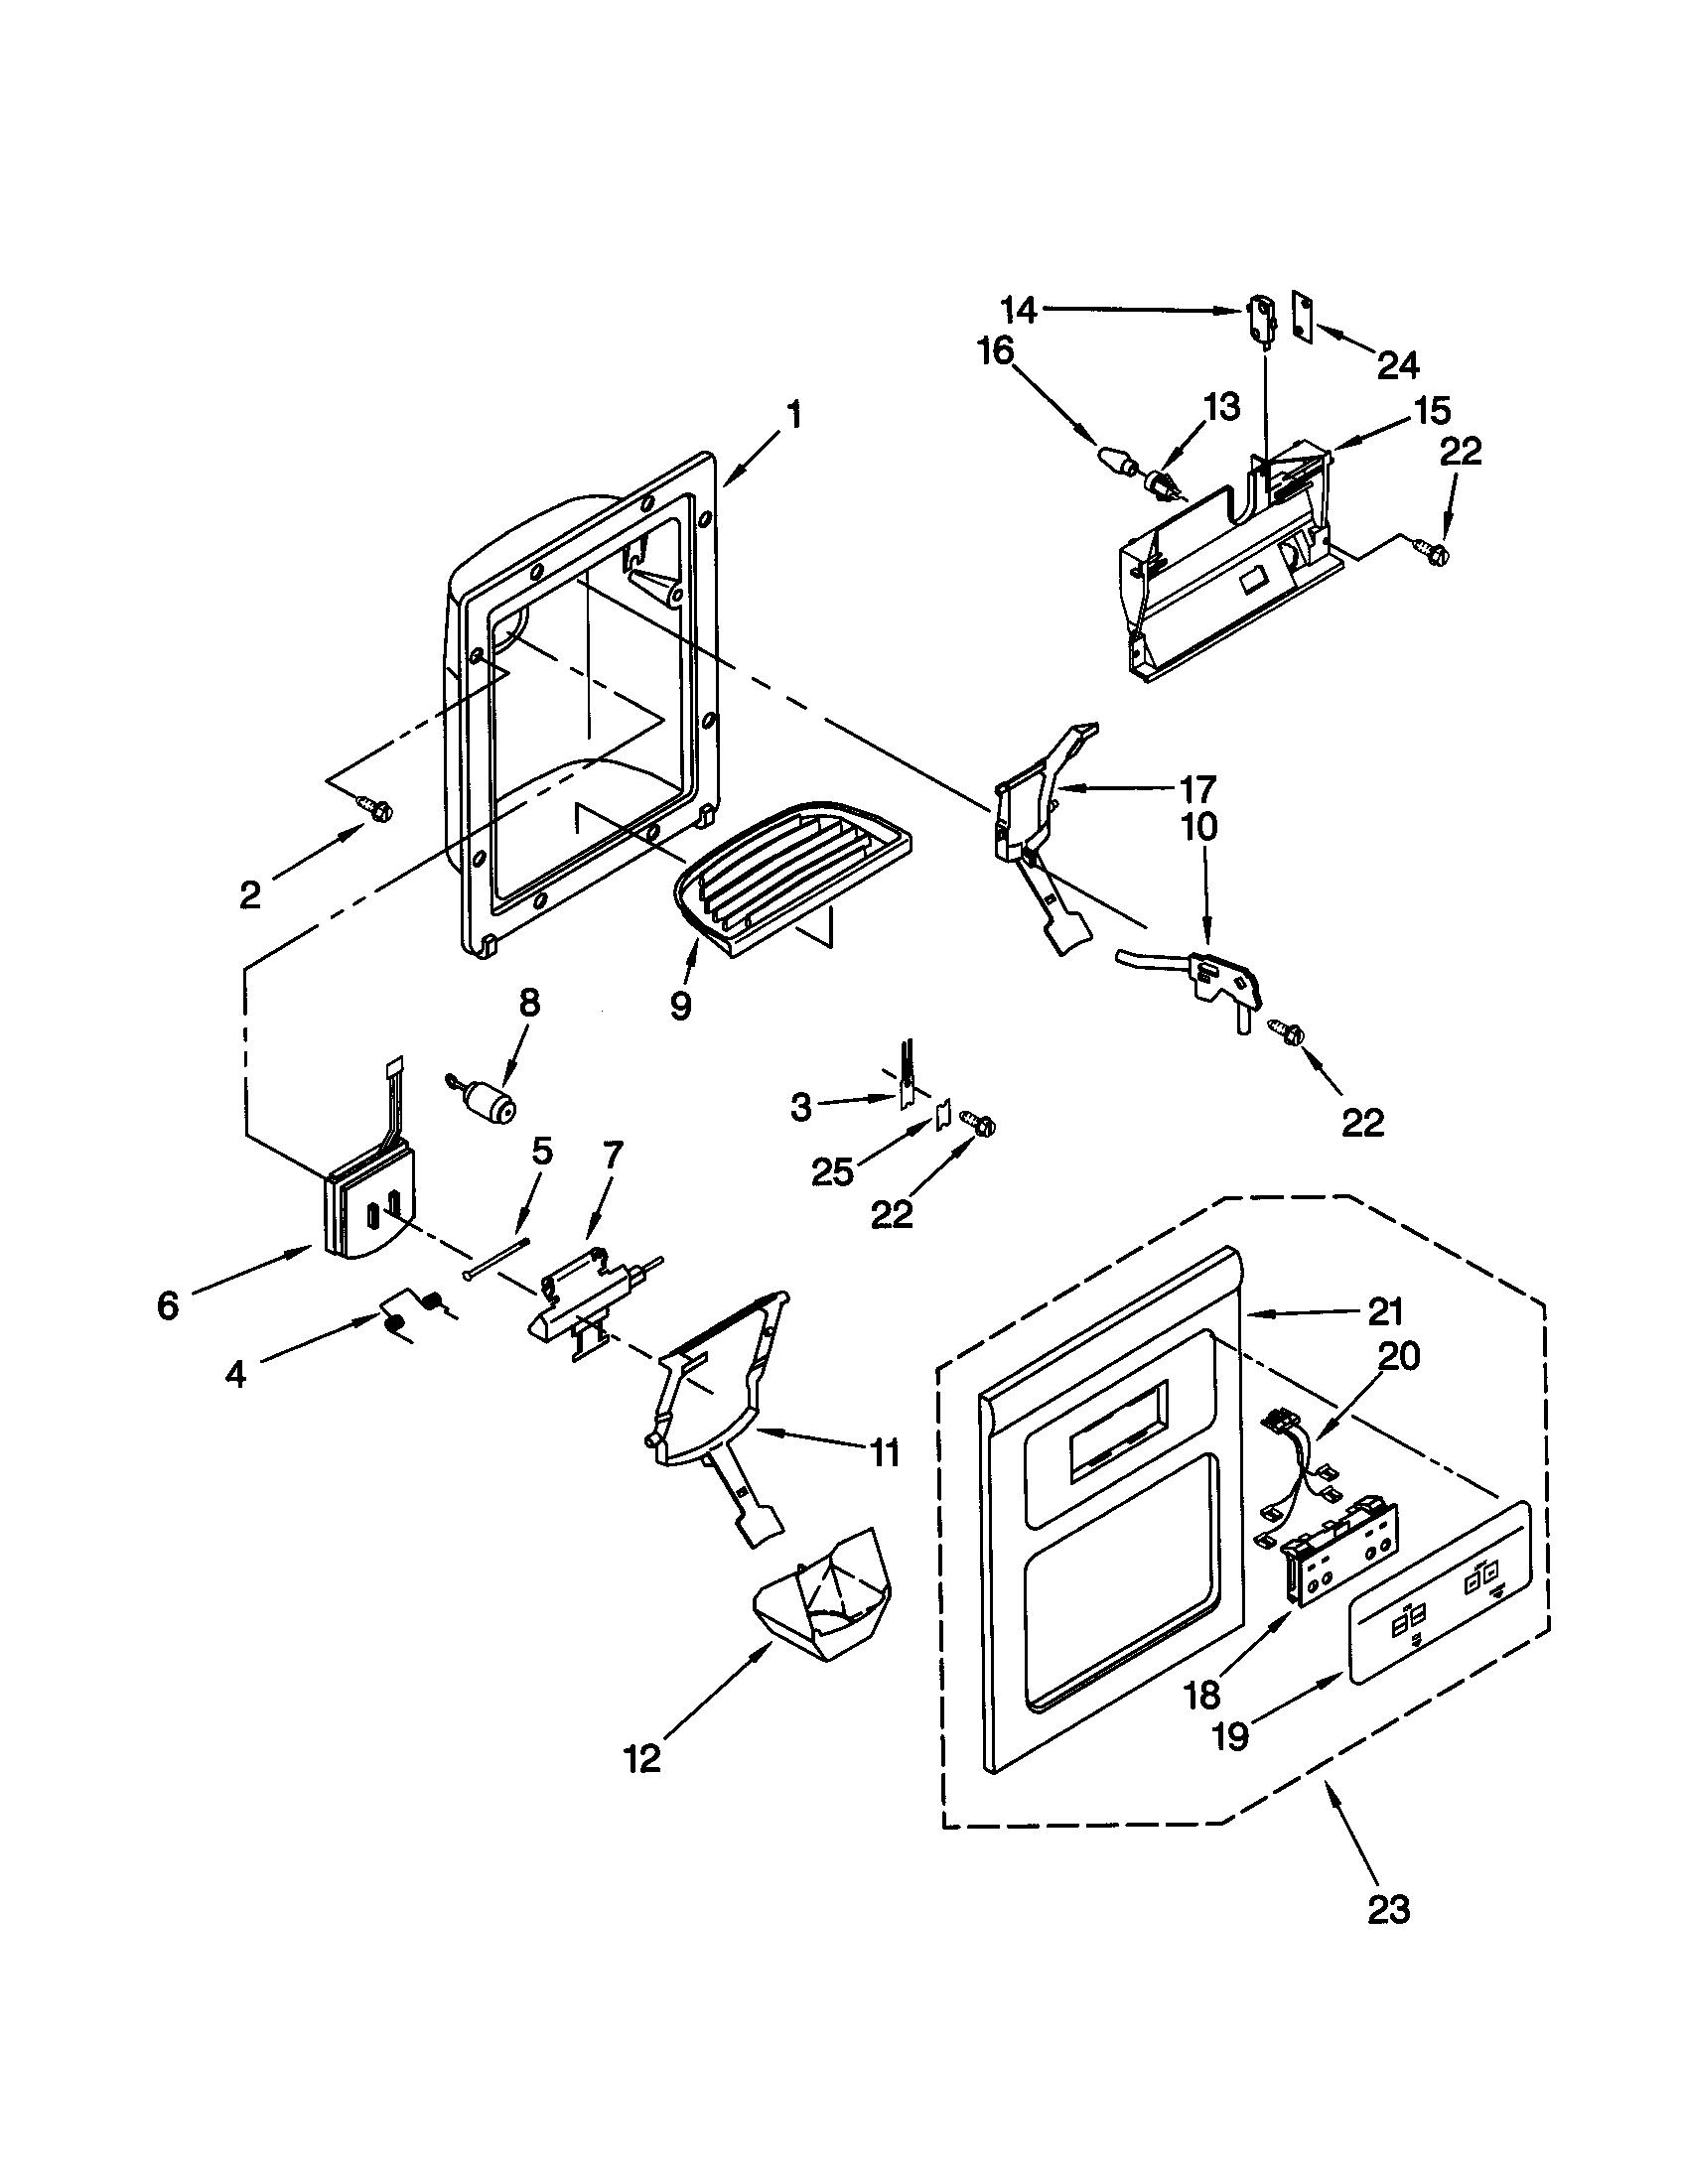 Kenmore Coldspot Model 106 Refrigerator Parts